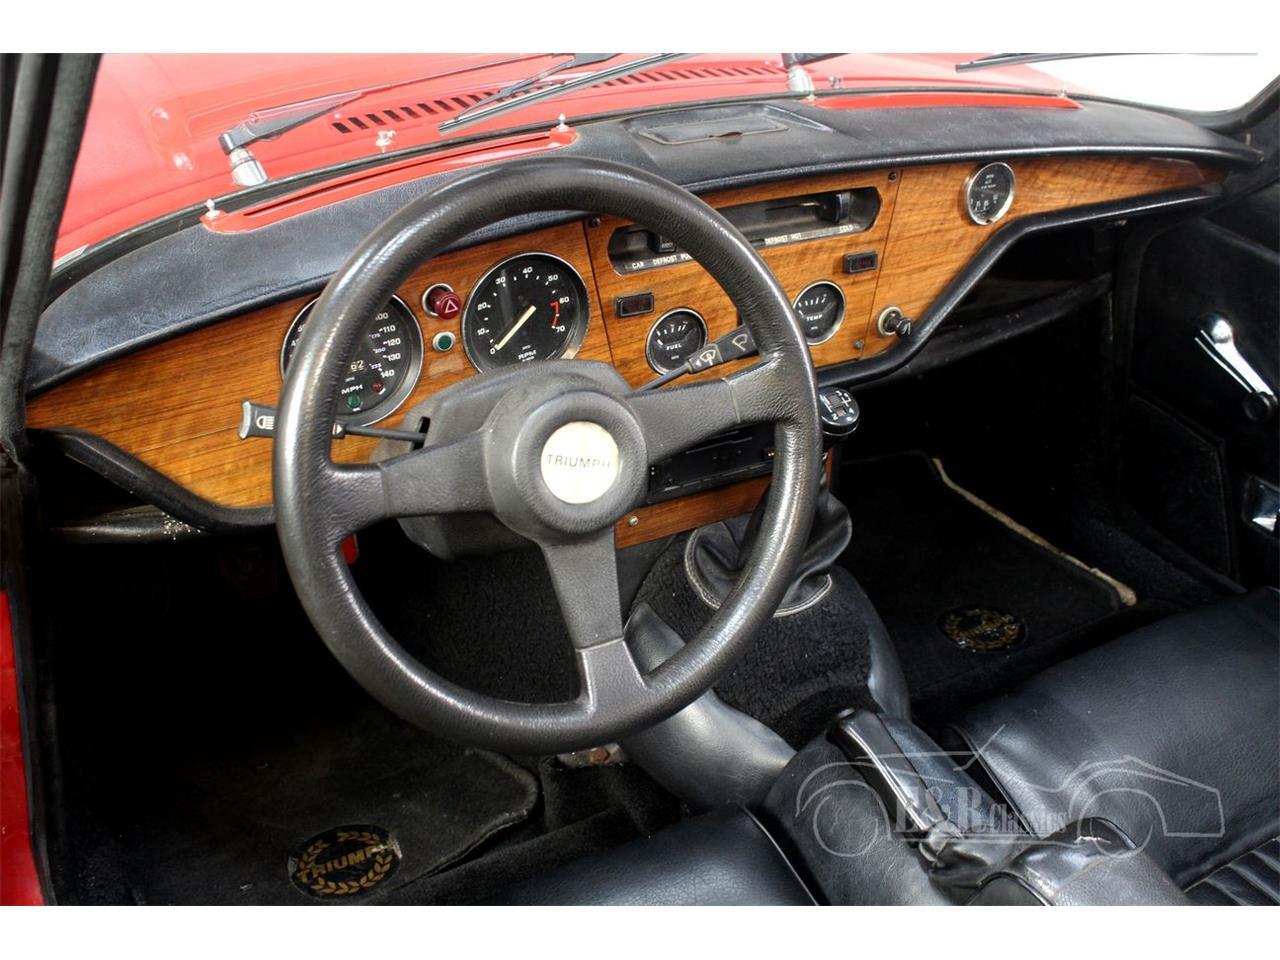 1979 Triumph Spitfire (CC-1389303) for sale in Waalwijk, Noord Brabant